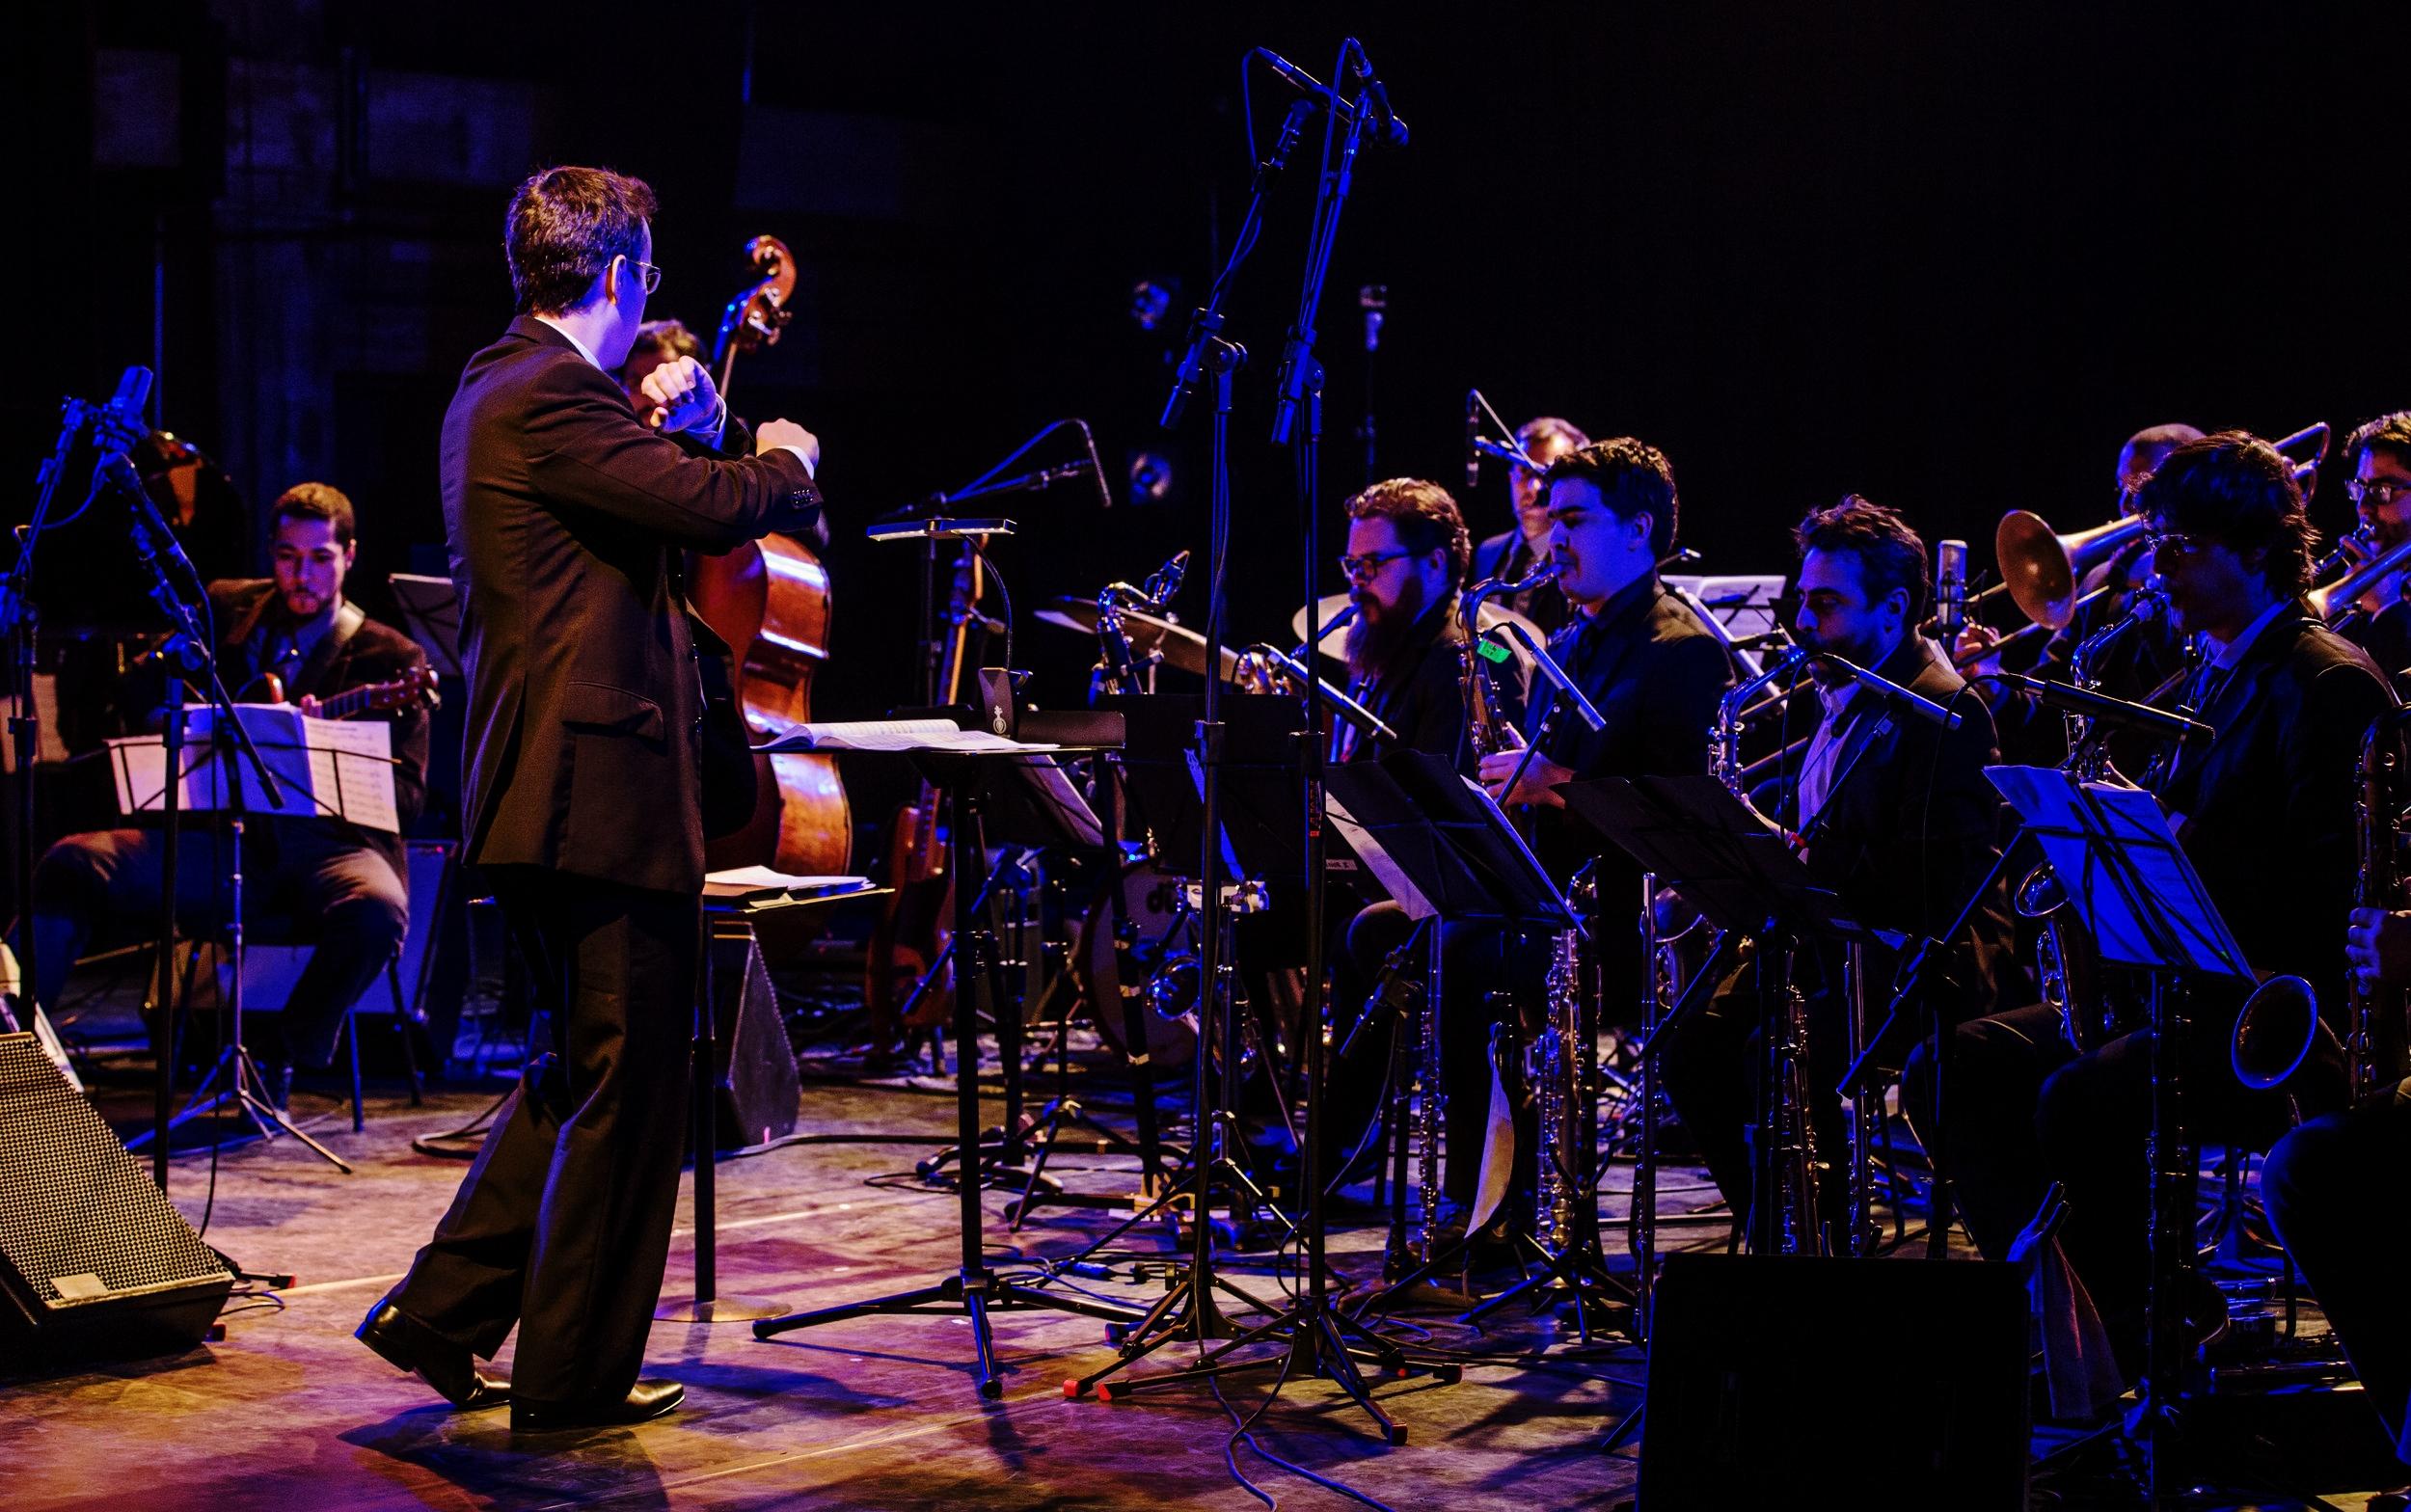 Rafael Piccolotto de Lima and Orquestra Urbana at SESC POMPEIA, São Paulo, Brazil.